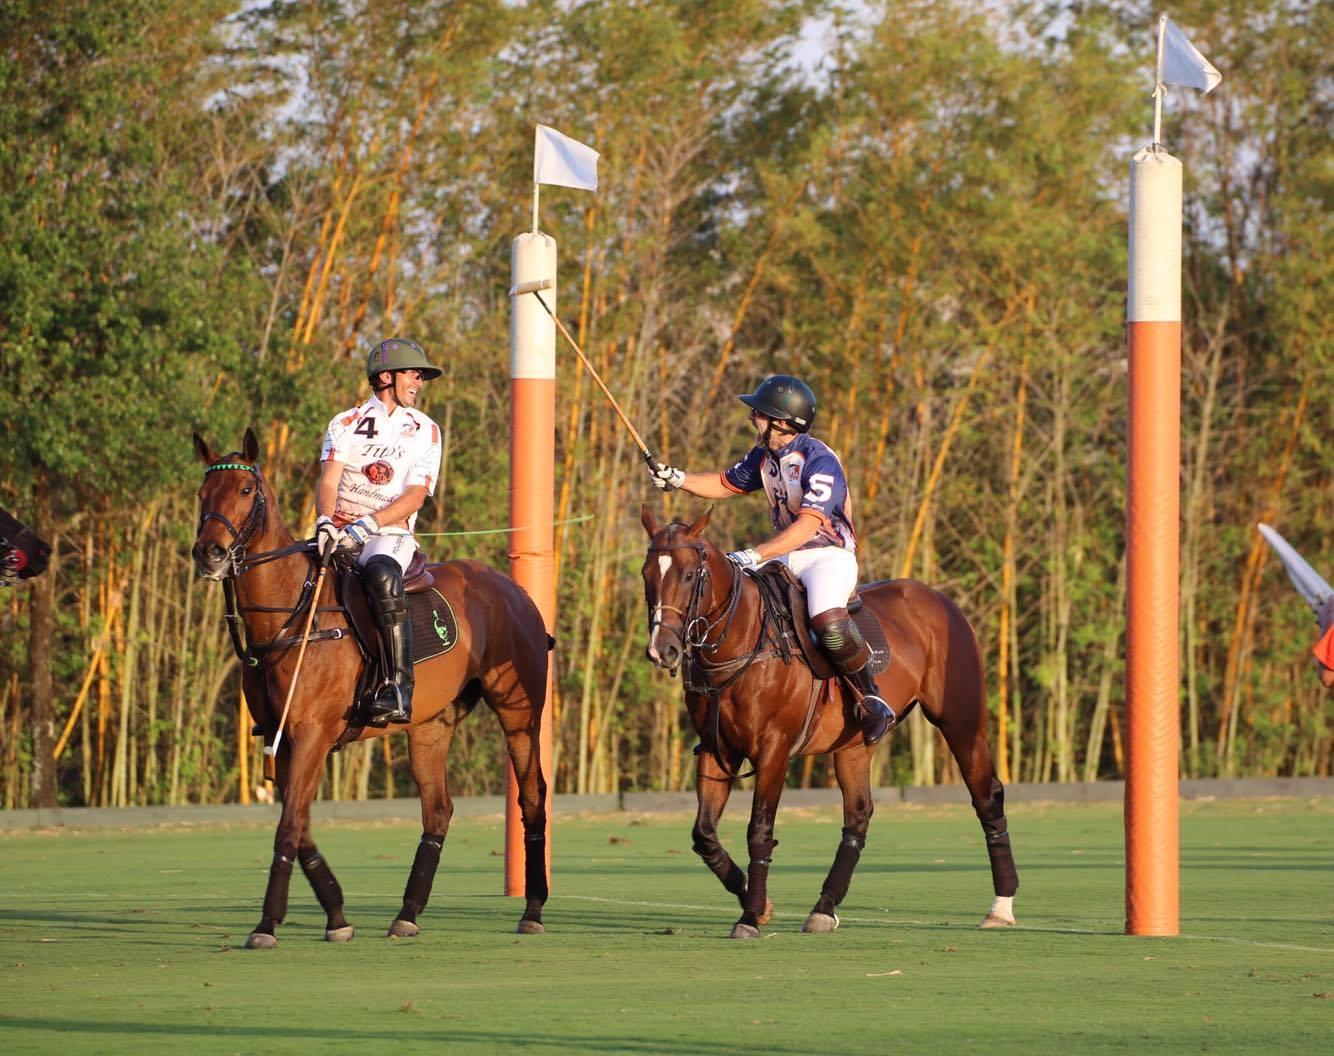 Nic Roldan & Darren Marotta; Nic Roldan's 2nd Annual Sunset Polo & White Party, FL, by Candace Ferreira.jpg